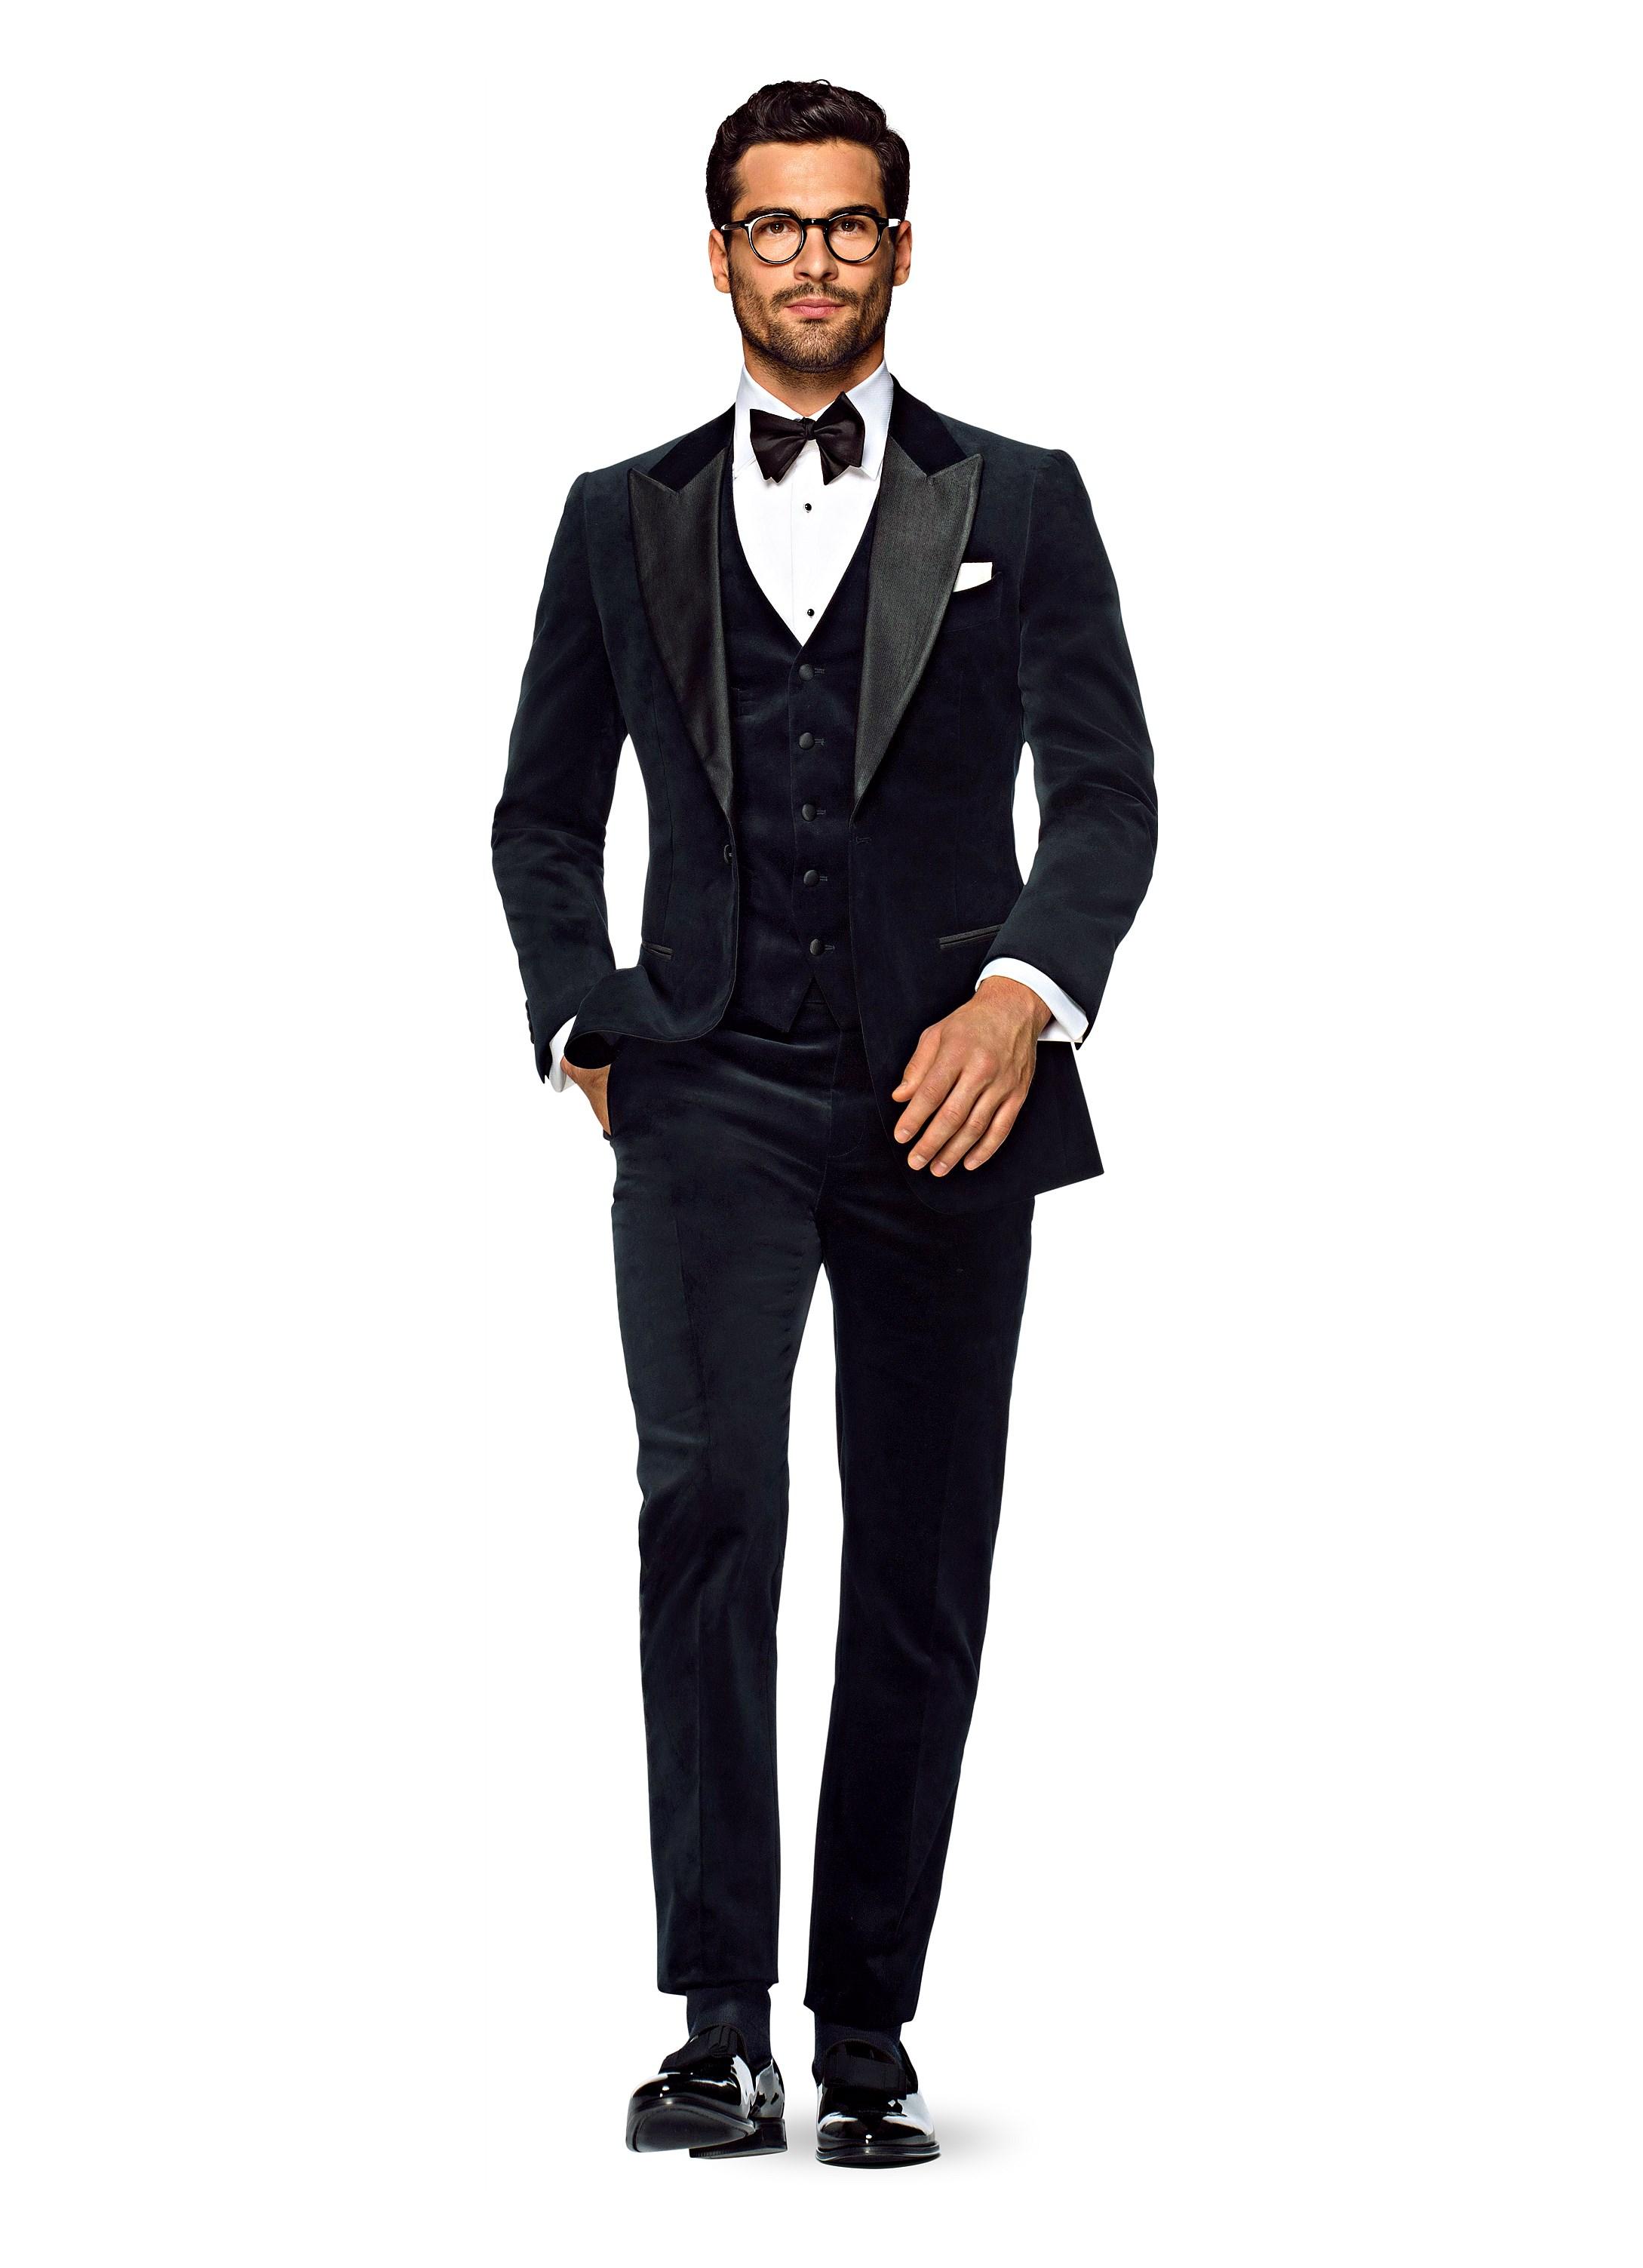 Suit Supply Winter Velvet Tux